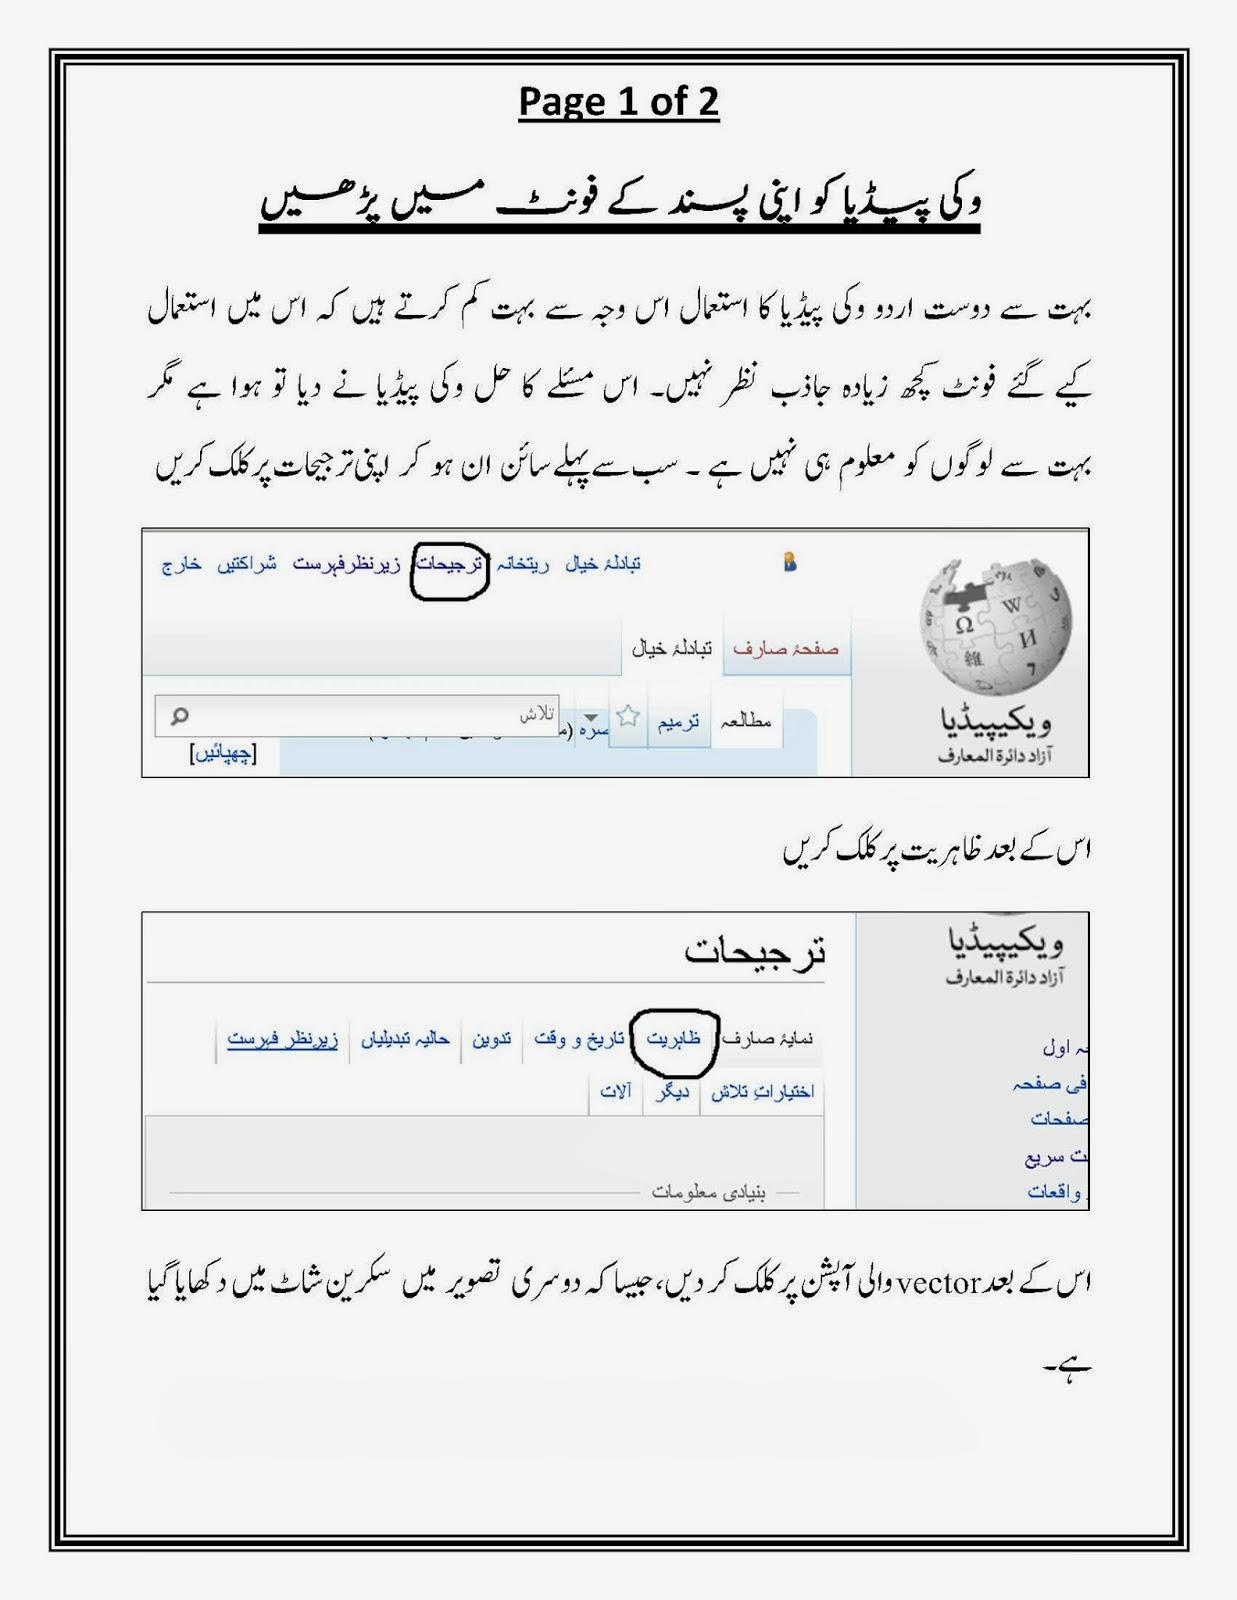 Jameel Noori Nastaleeq Font For Website - livinstealth